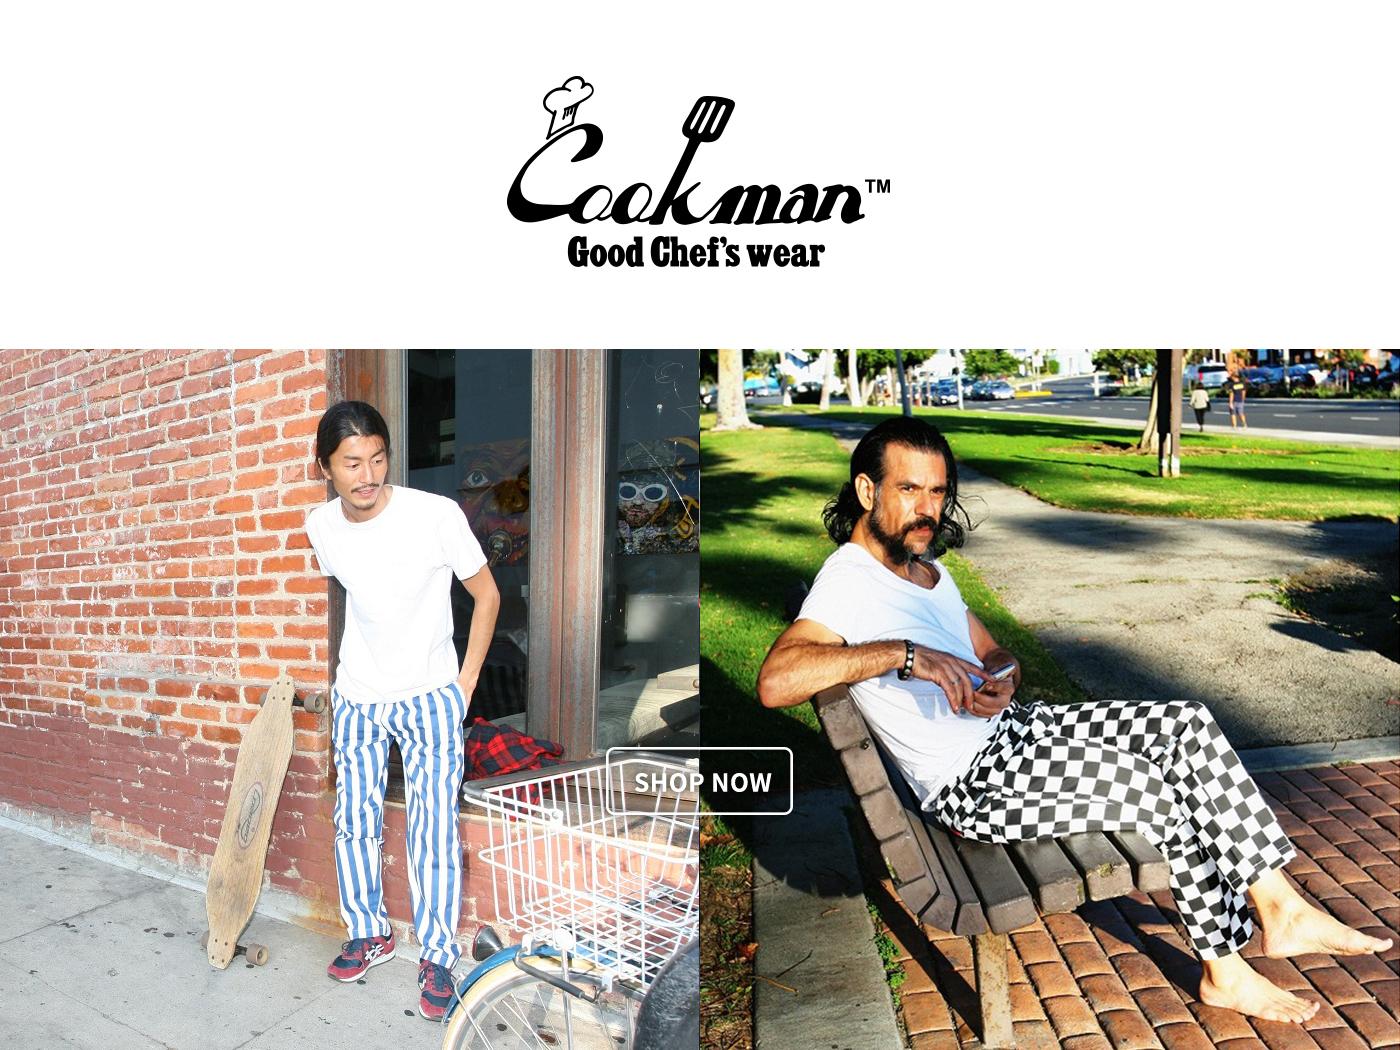 cookman,cookman pants,廚師褲,cookman 大阪,cookman 台灣,cookman tw,cookman コーデ,廚師,美國廚師,美國洛杉磯,西岸廚師